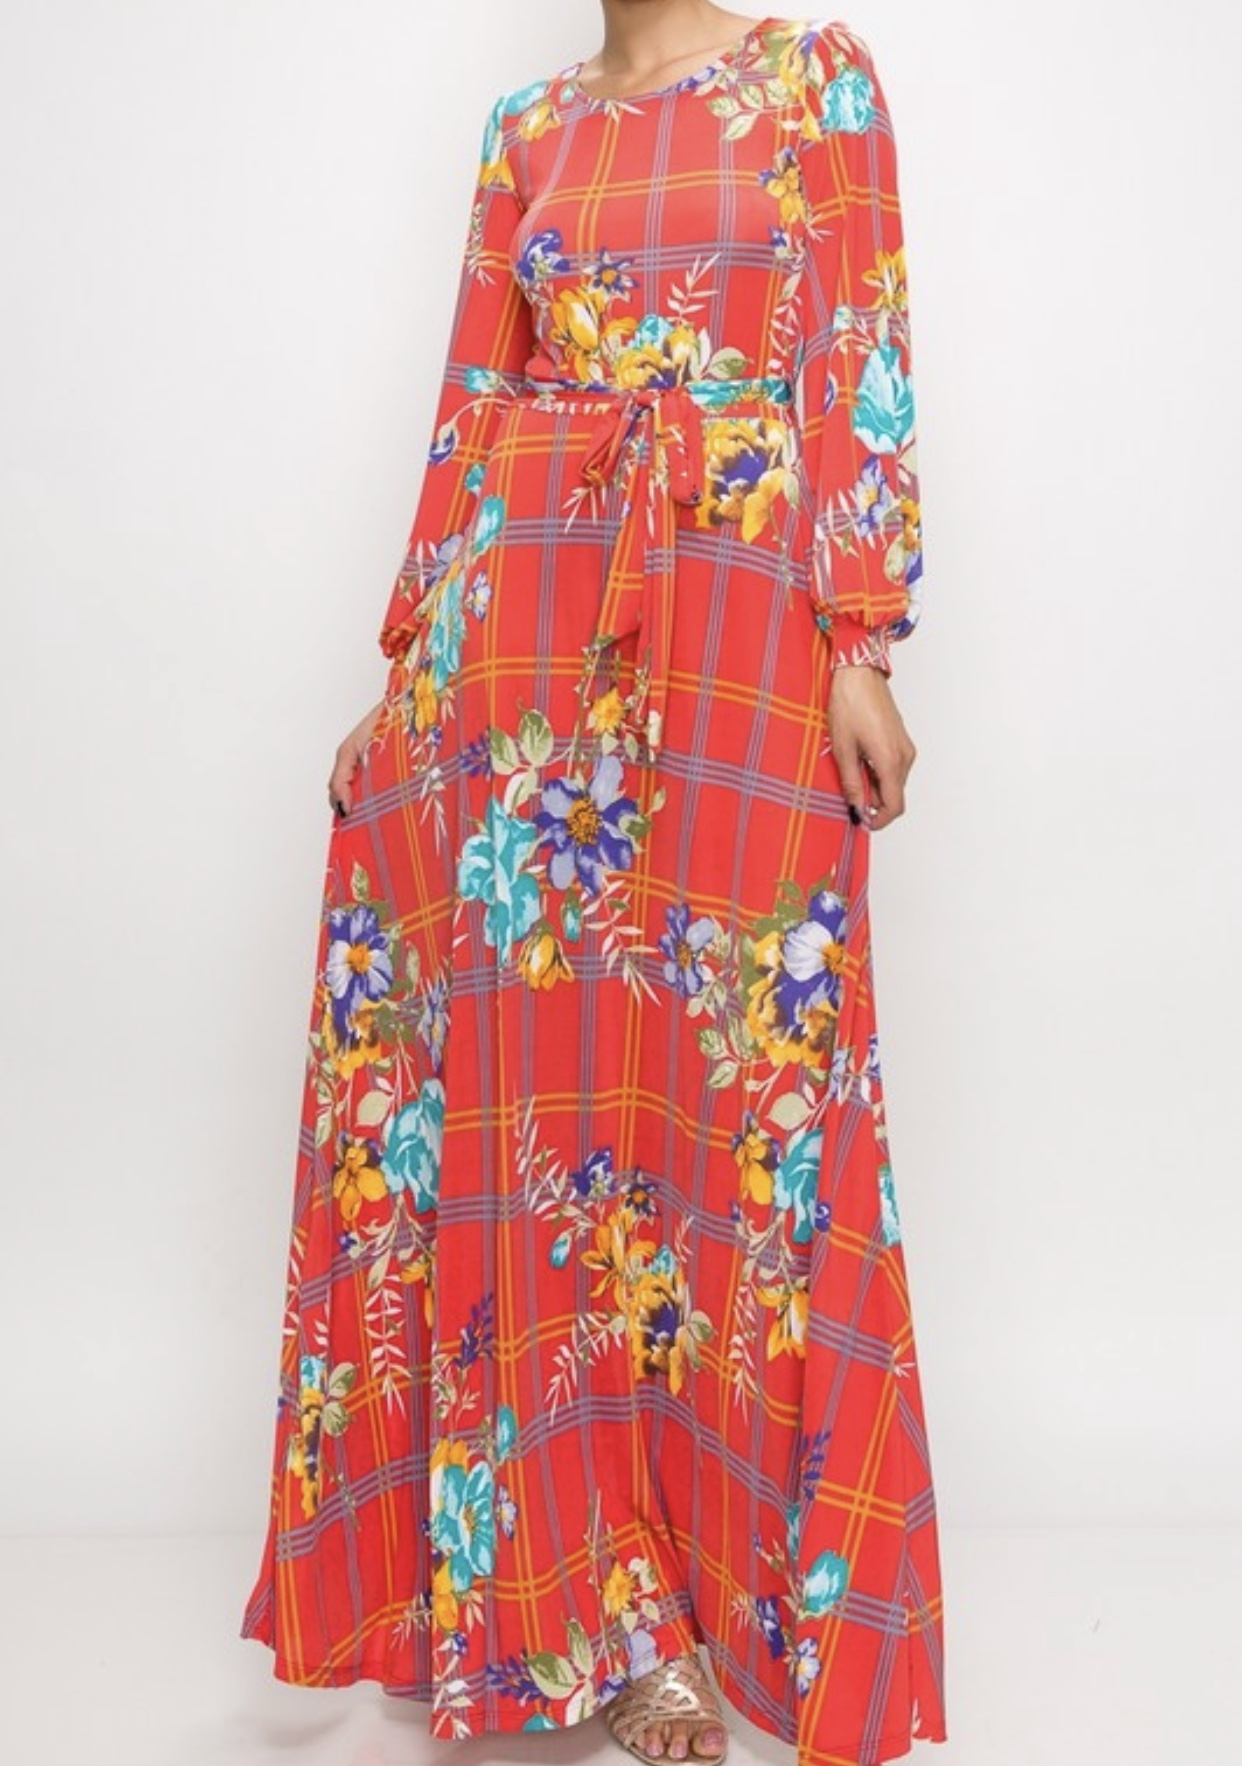 35337eb28529 Coral Window Pane Floral Long Maxi Dress - Shannasthreads